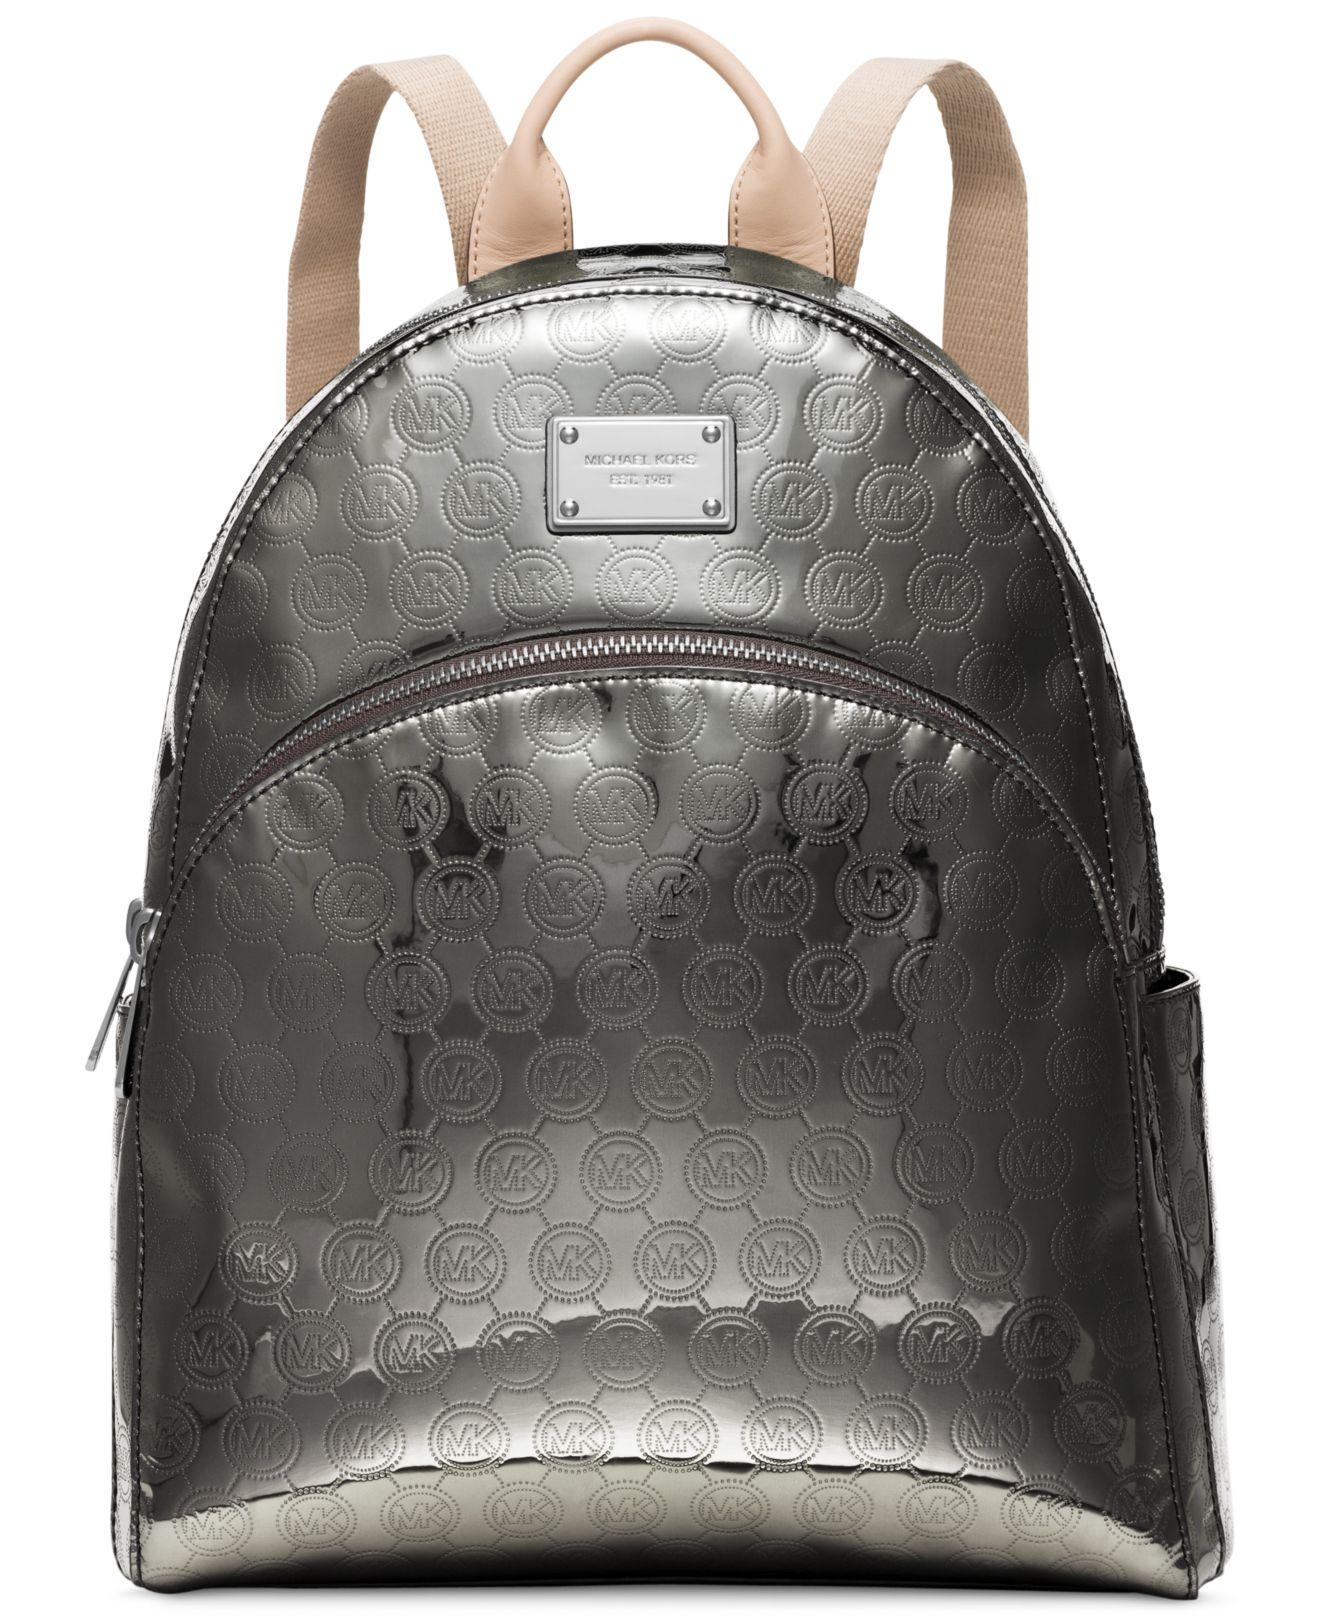 168baae8696d4 ... buy lyst michael kors michael jet set item large backpack in metallic  8fae6 999bb